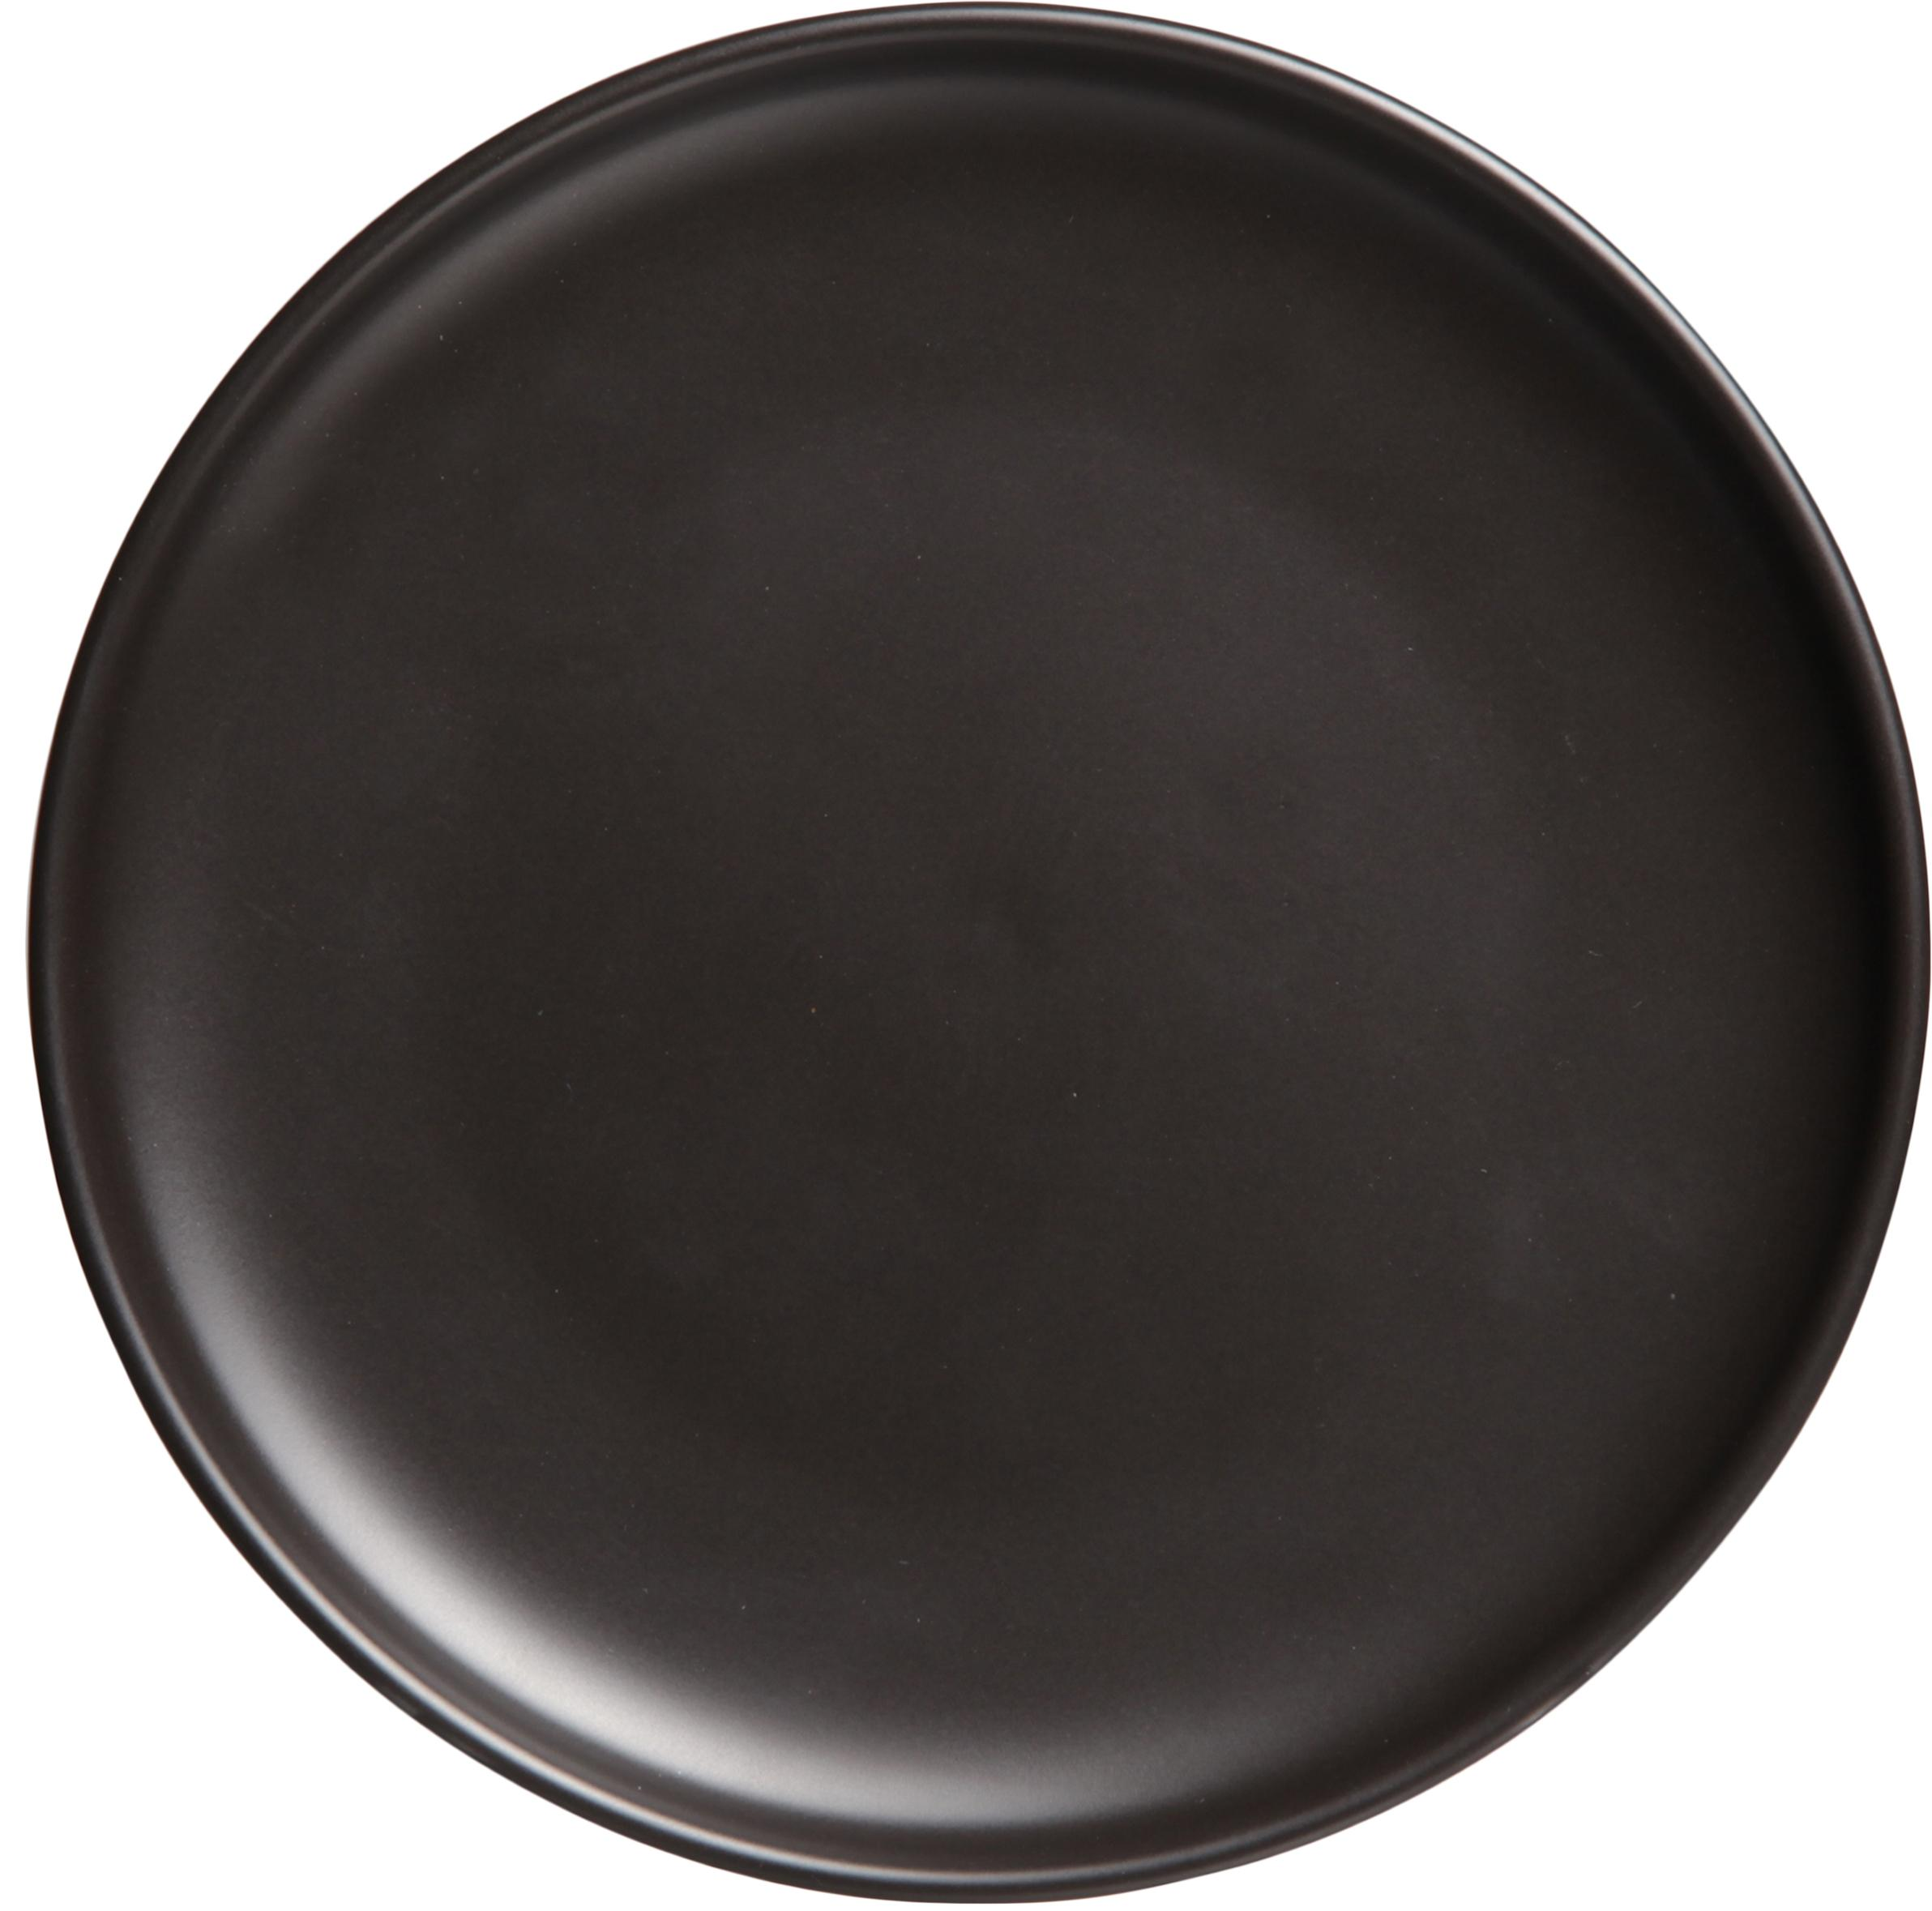 Speiseteller Okinawa in Schwarz matt, 4 Stück, Keramik, Schwarz, matt, Ø 27 cm